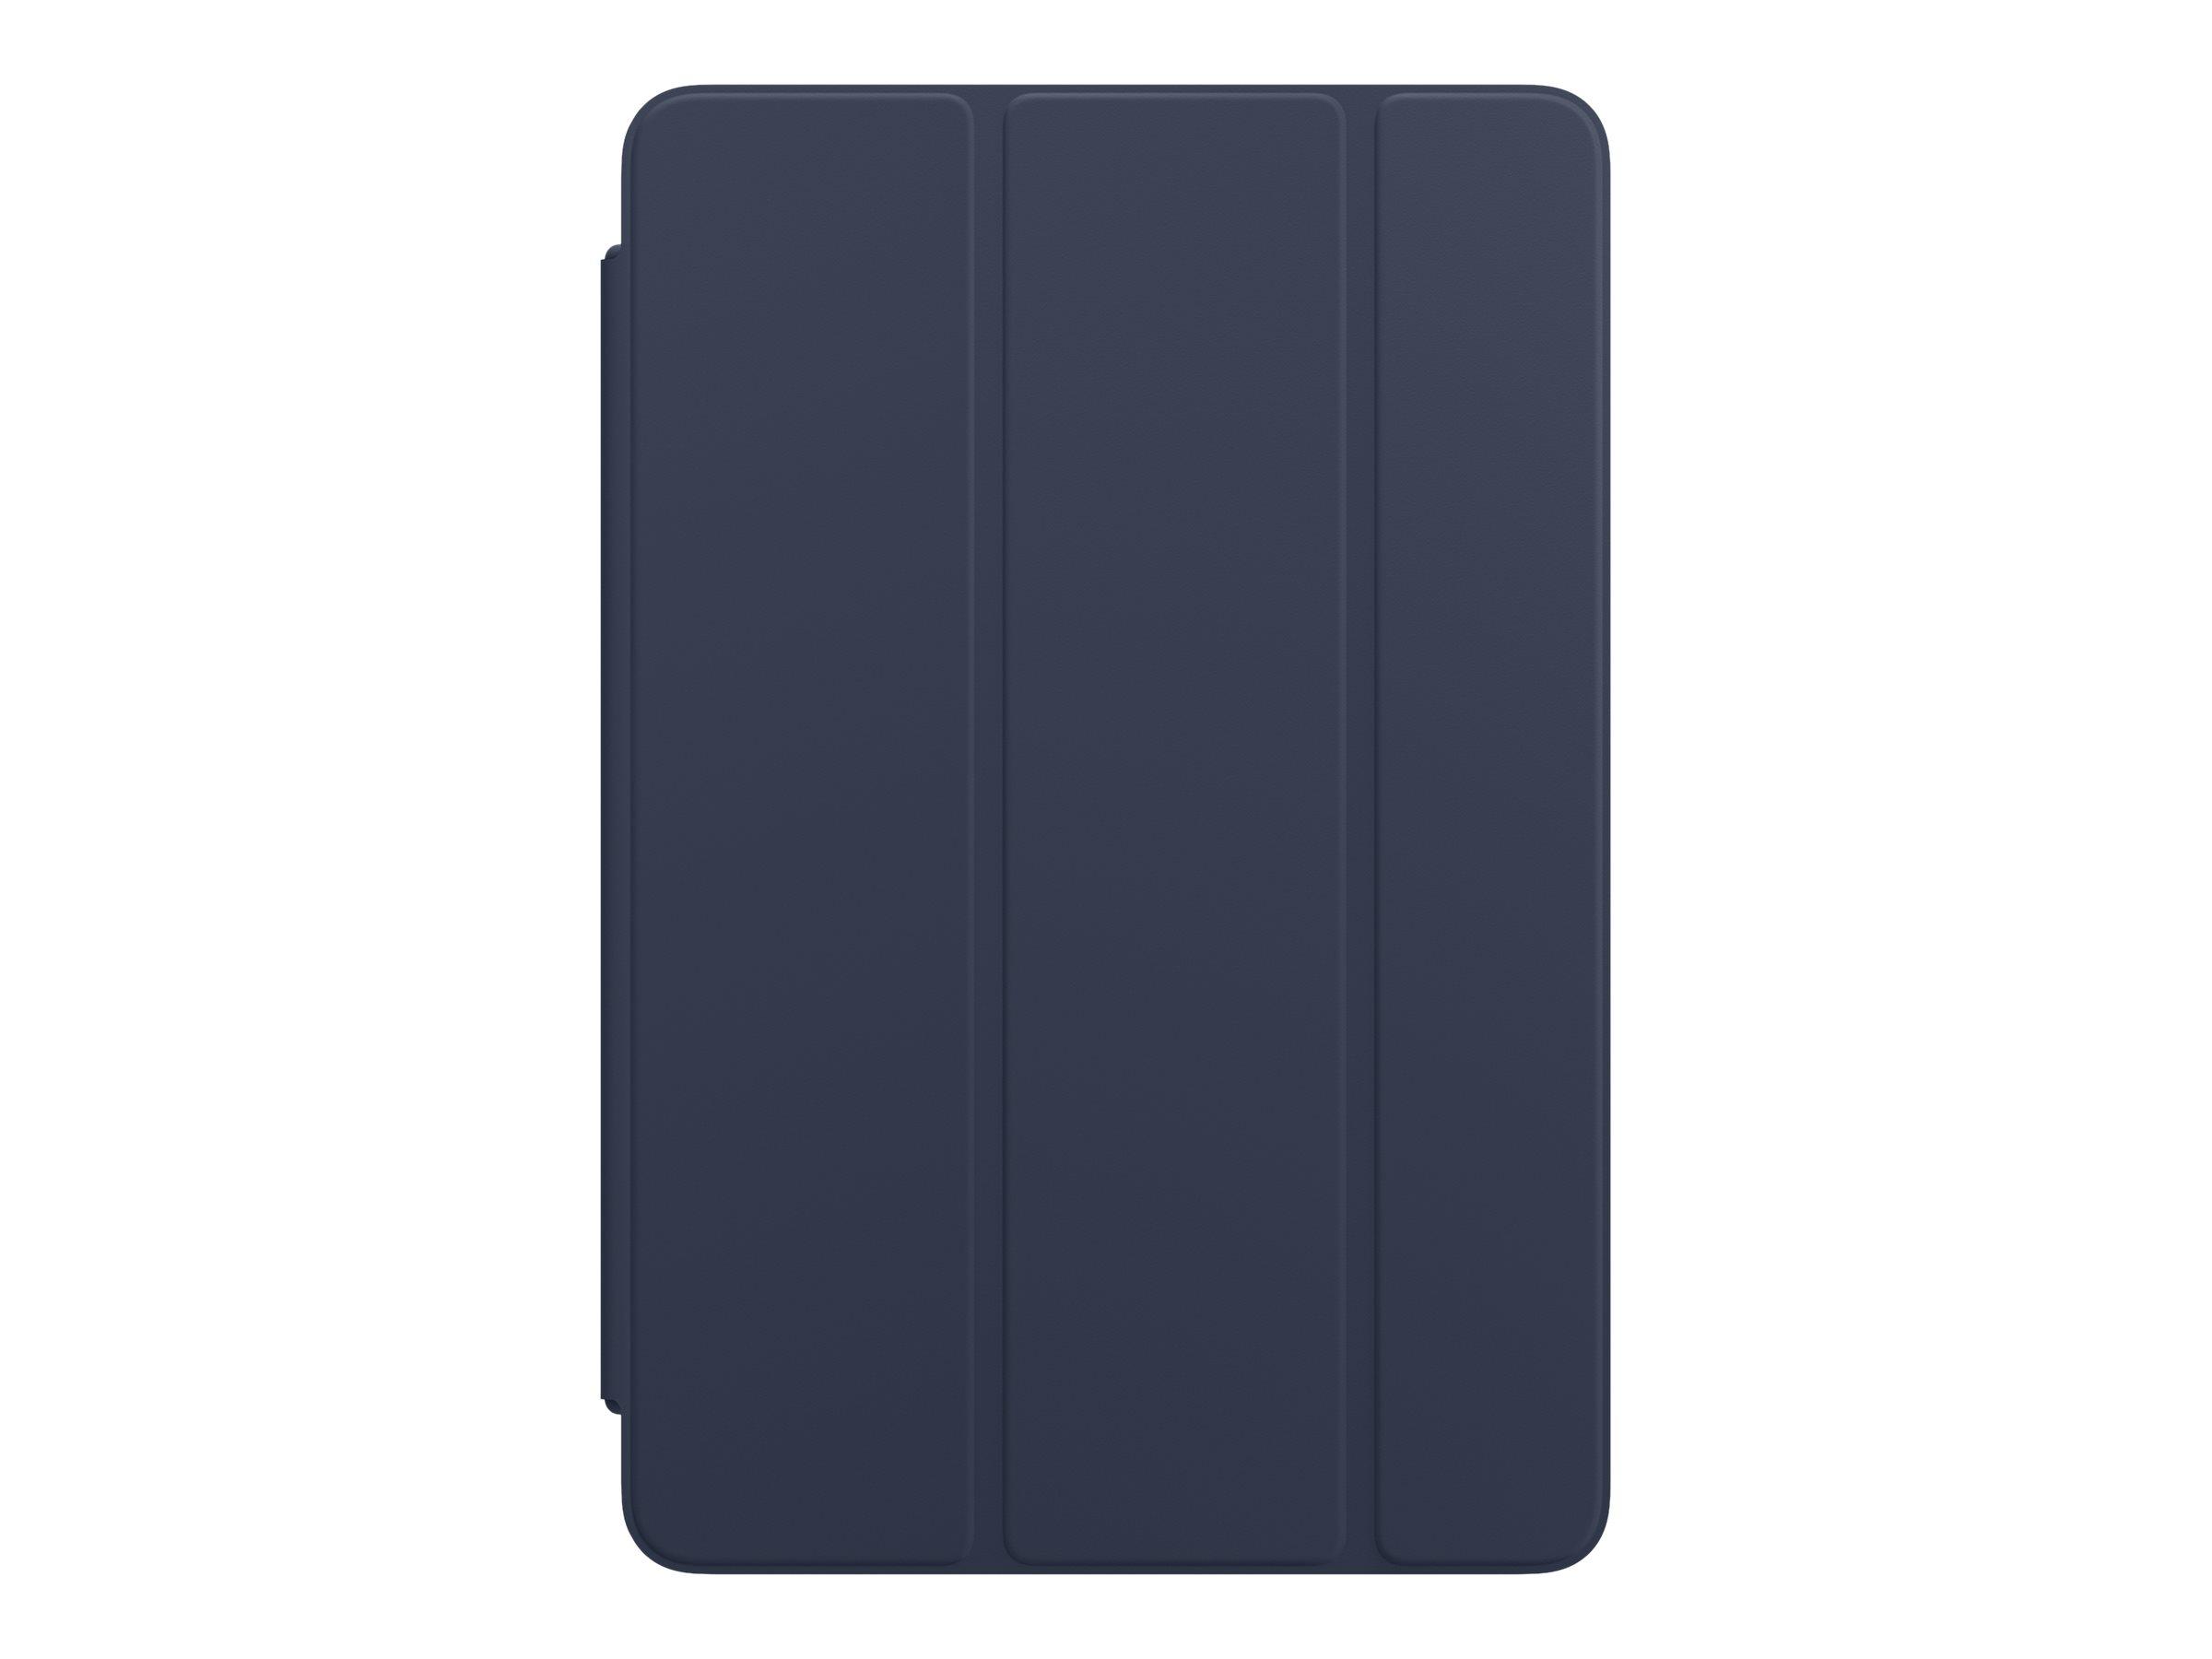 Smart flip huelle fuer tablet polyurethan tief marineblau fuer ipad mini 4 5 14778094 mgyu3zm a